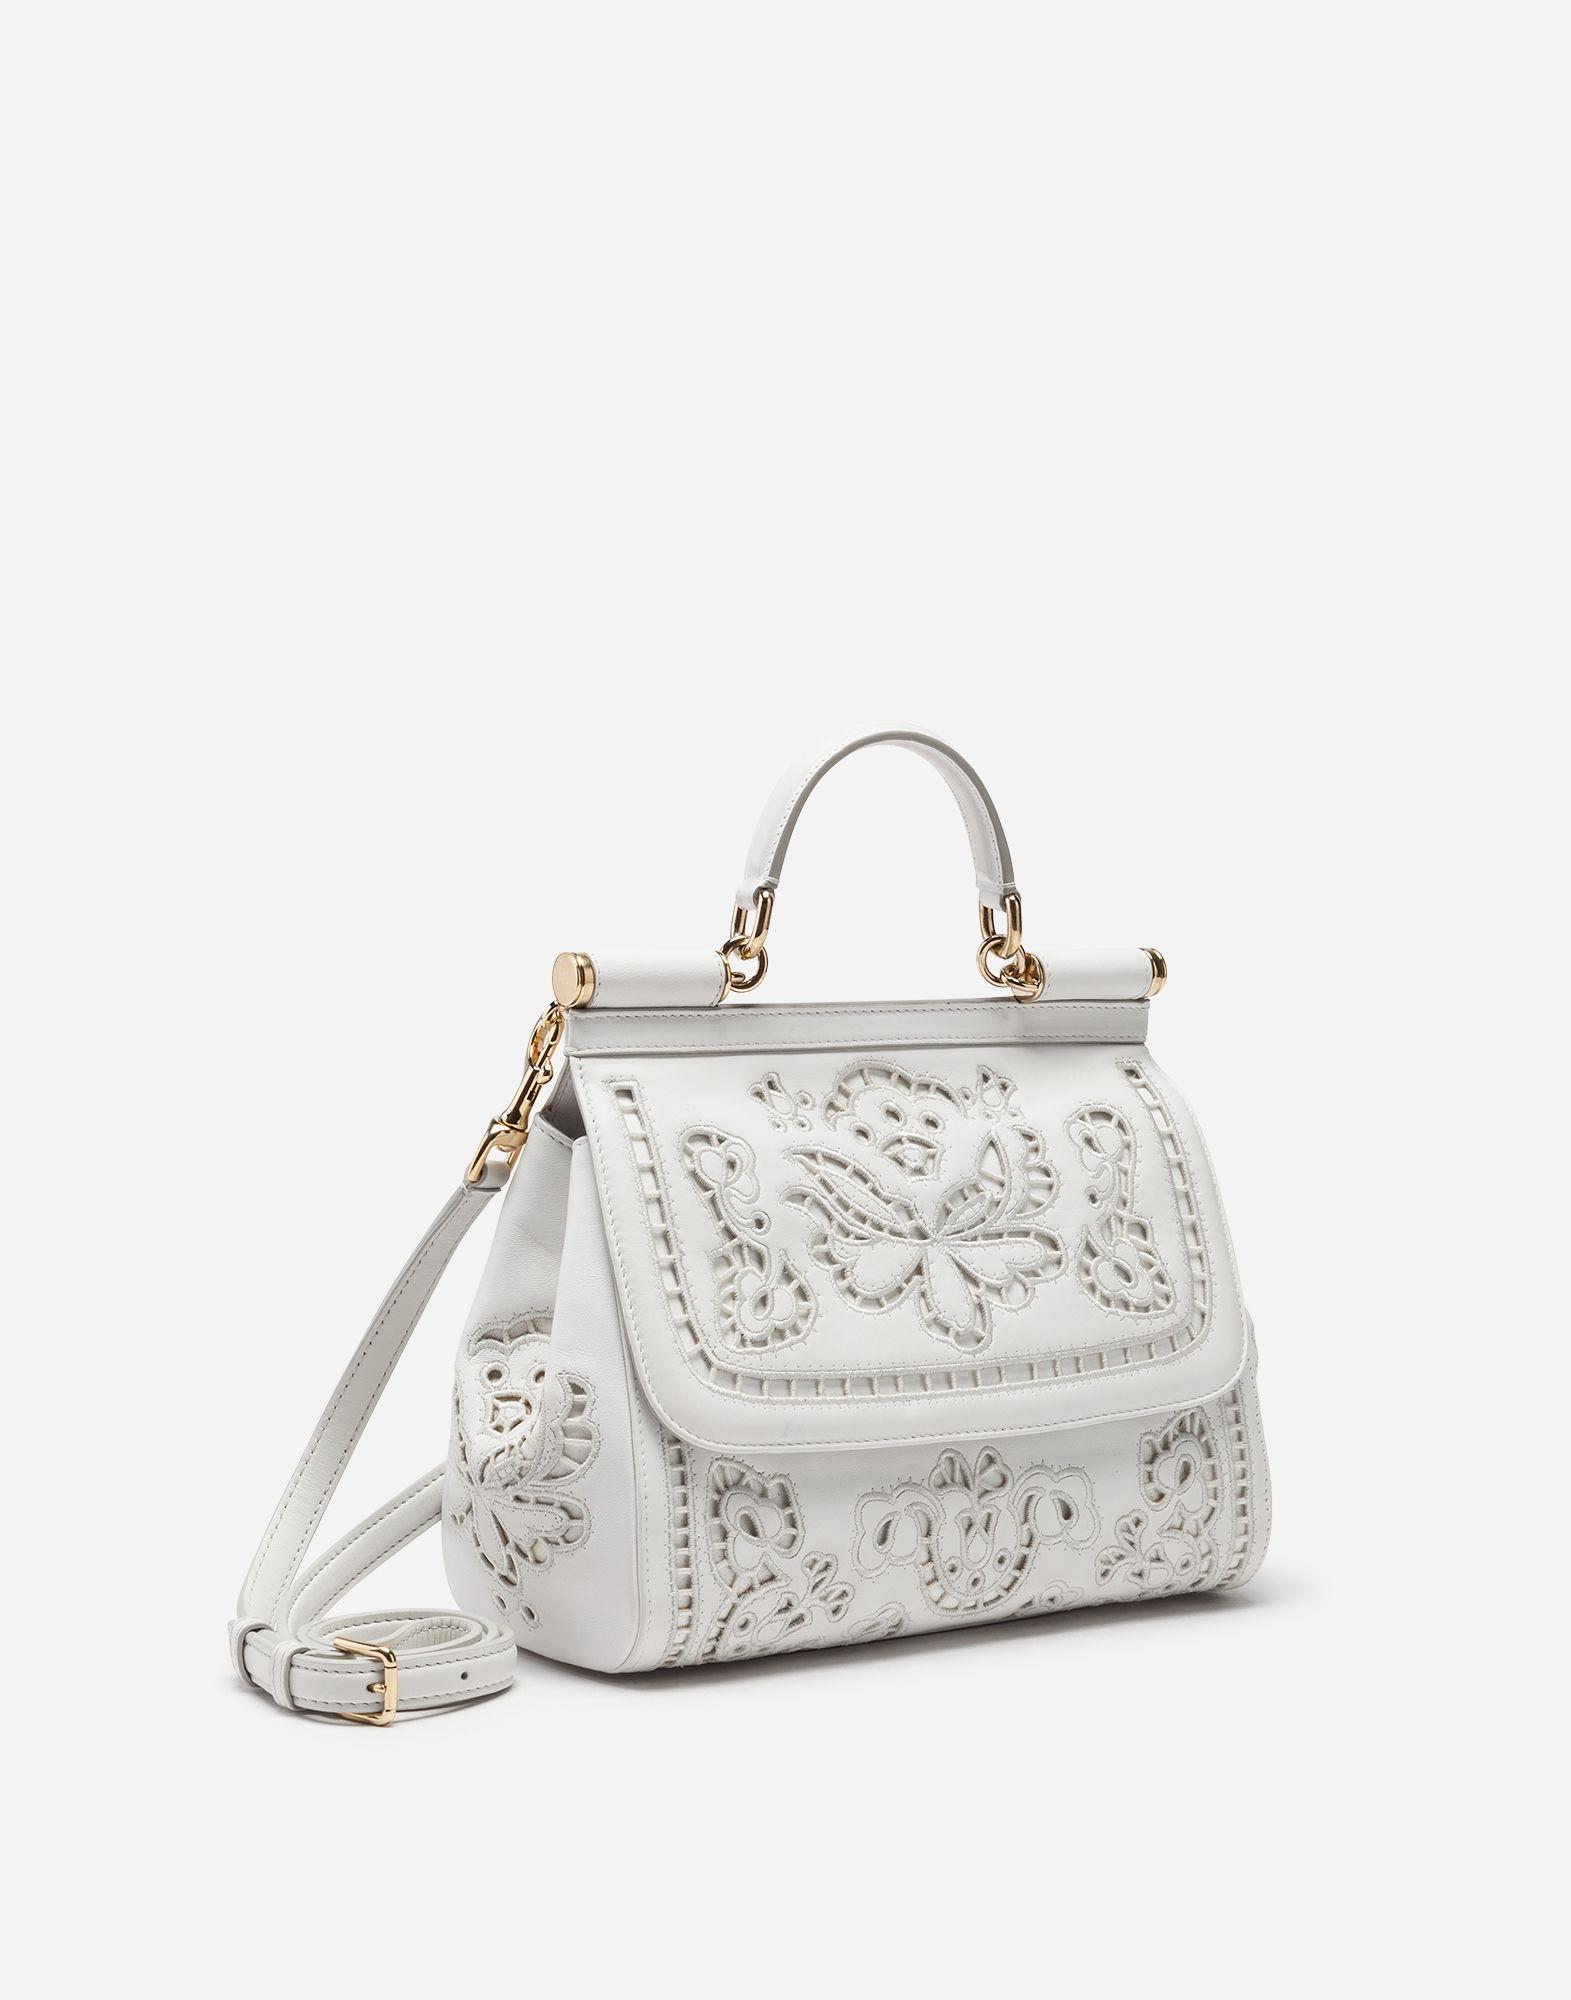 7d1d95847b46 Lyst - Dolce   Gabbana Medium Sicily Bag In Intaglio Nappa Leather in White